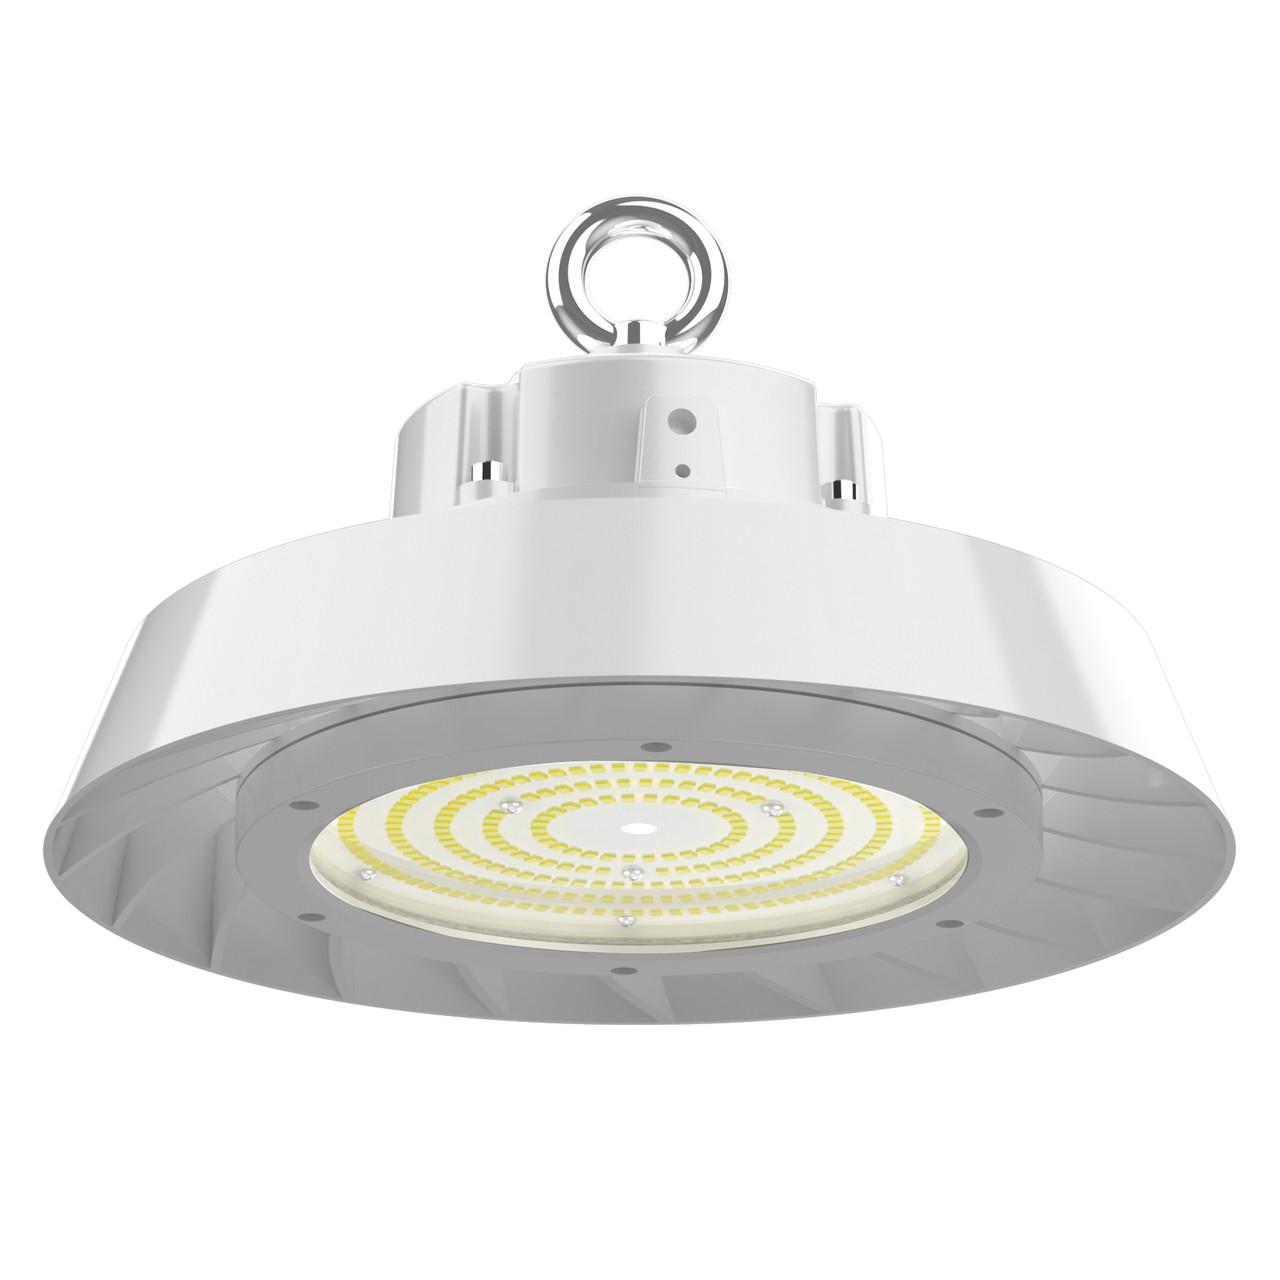 UFO LED High Bay 240 Watt , 33600 Lumen, 100-277 volt, 5000 Kelvin, DLC Premium and UL Listed, Dimmable, 6ft power cord, White (AL-UFE-240W-MV-WH)